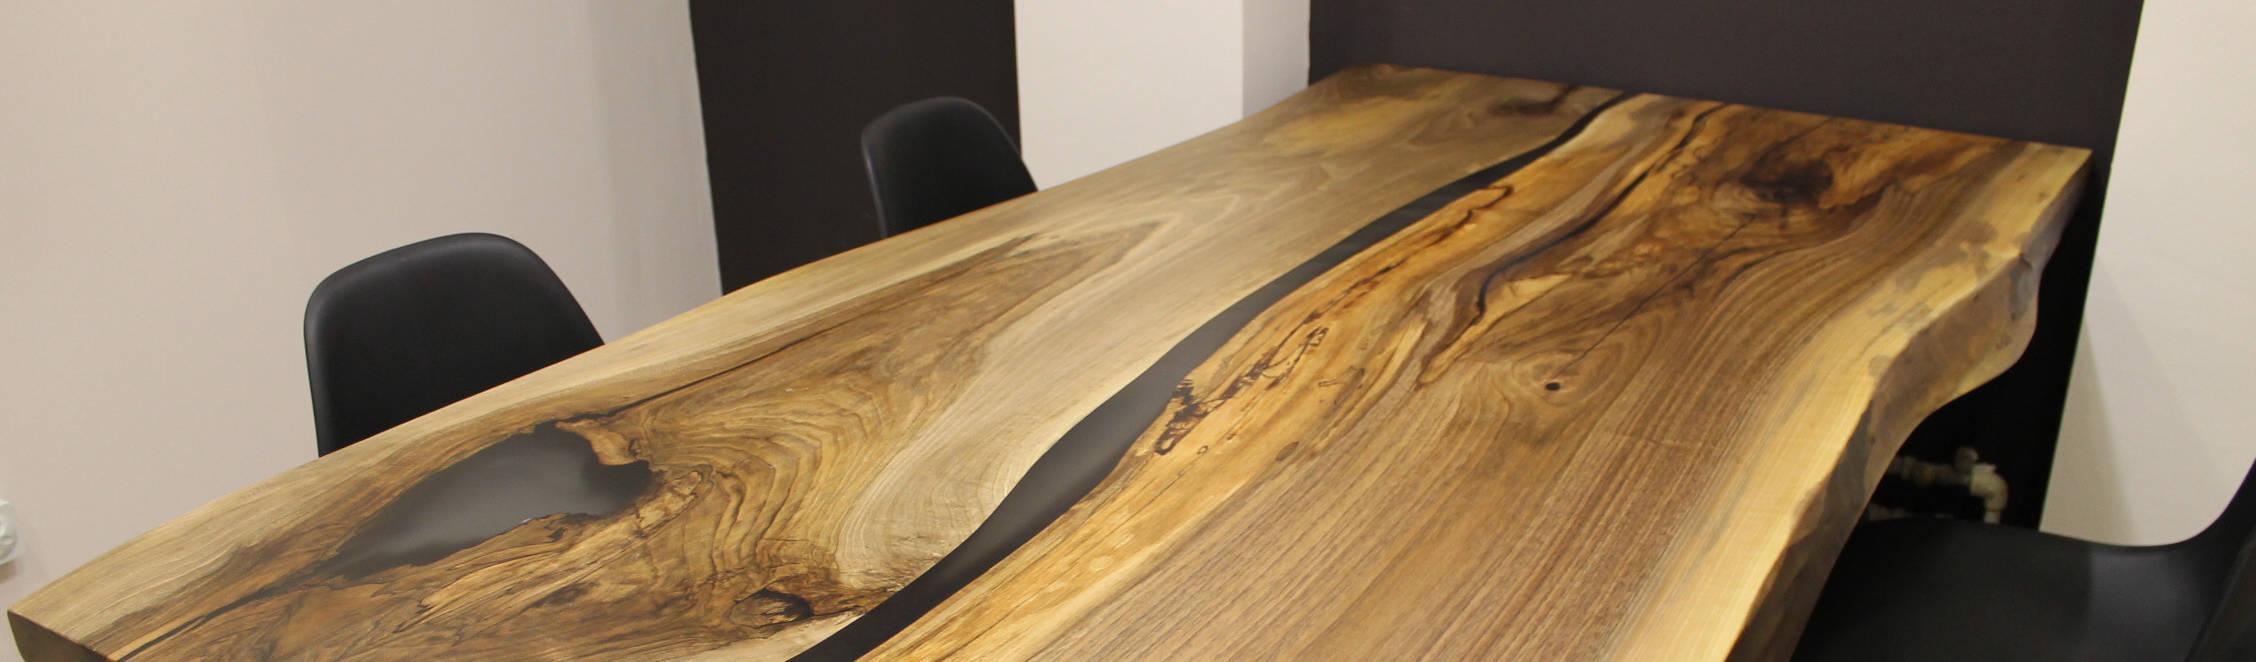 Wooden Stories